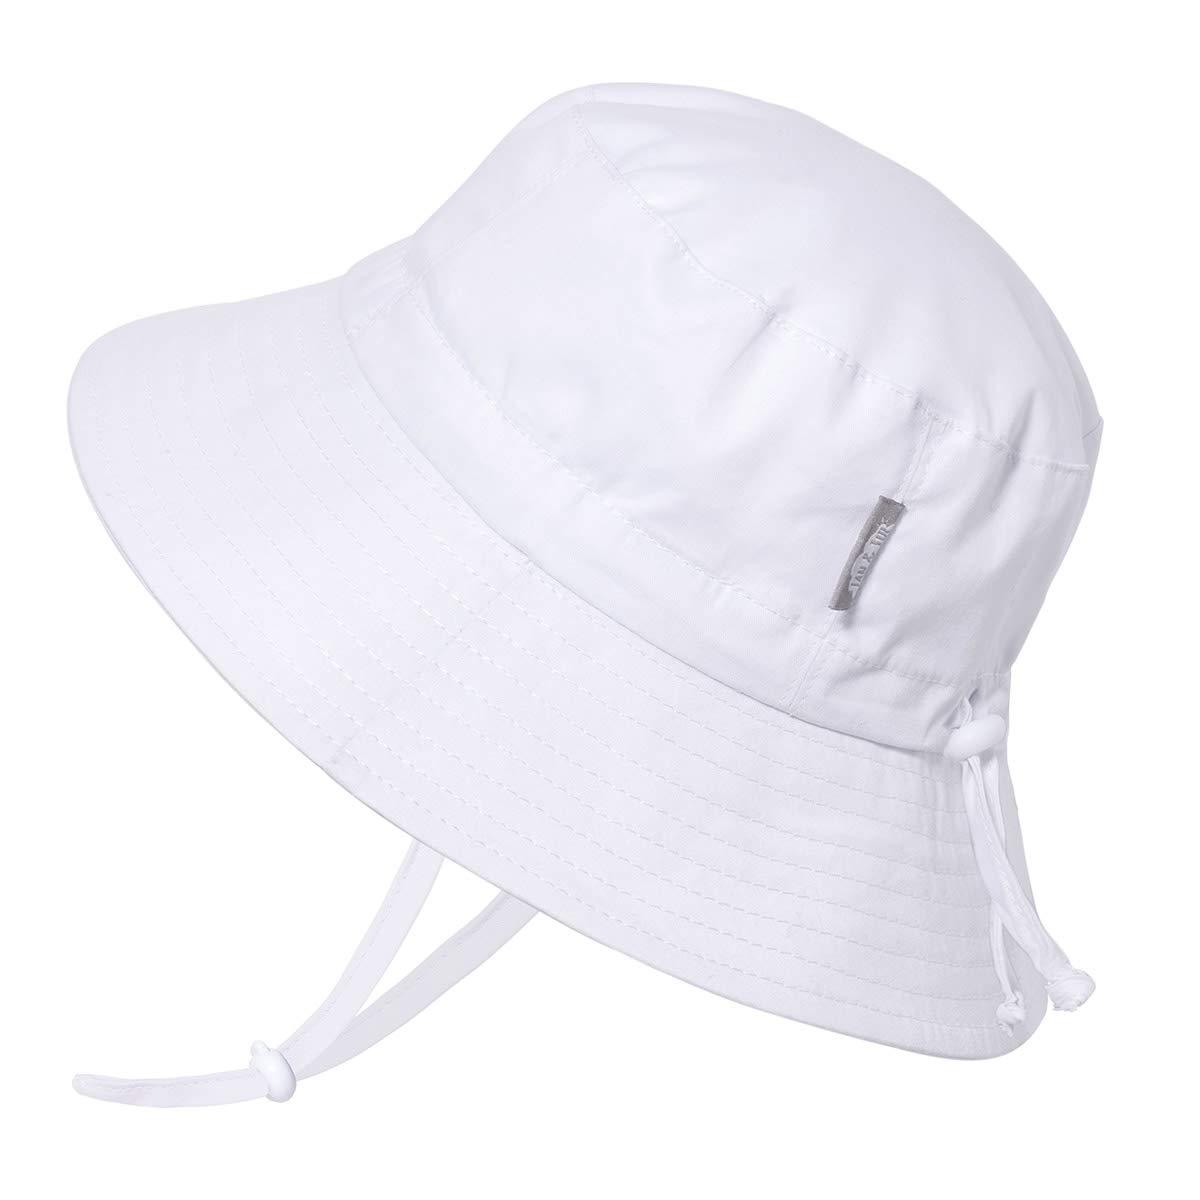 JAN & JUL Toddler Boys Girls Cotton Bucket Sun Hats 50 UPF, Drawstring Adjustable, Stay-on Tie (M: 6-24m, White) by JAN & JUL